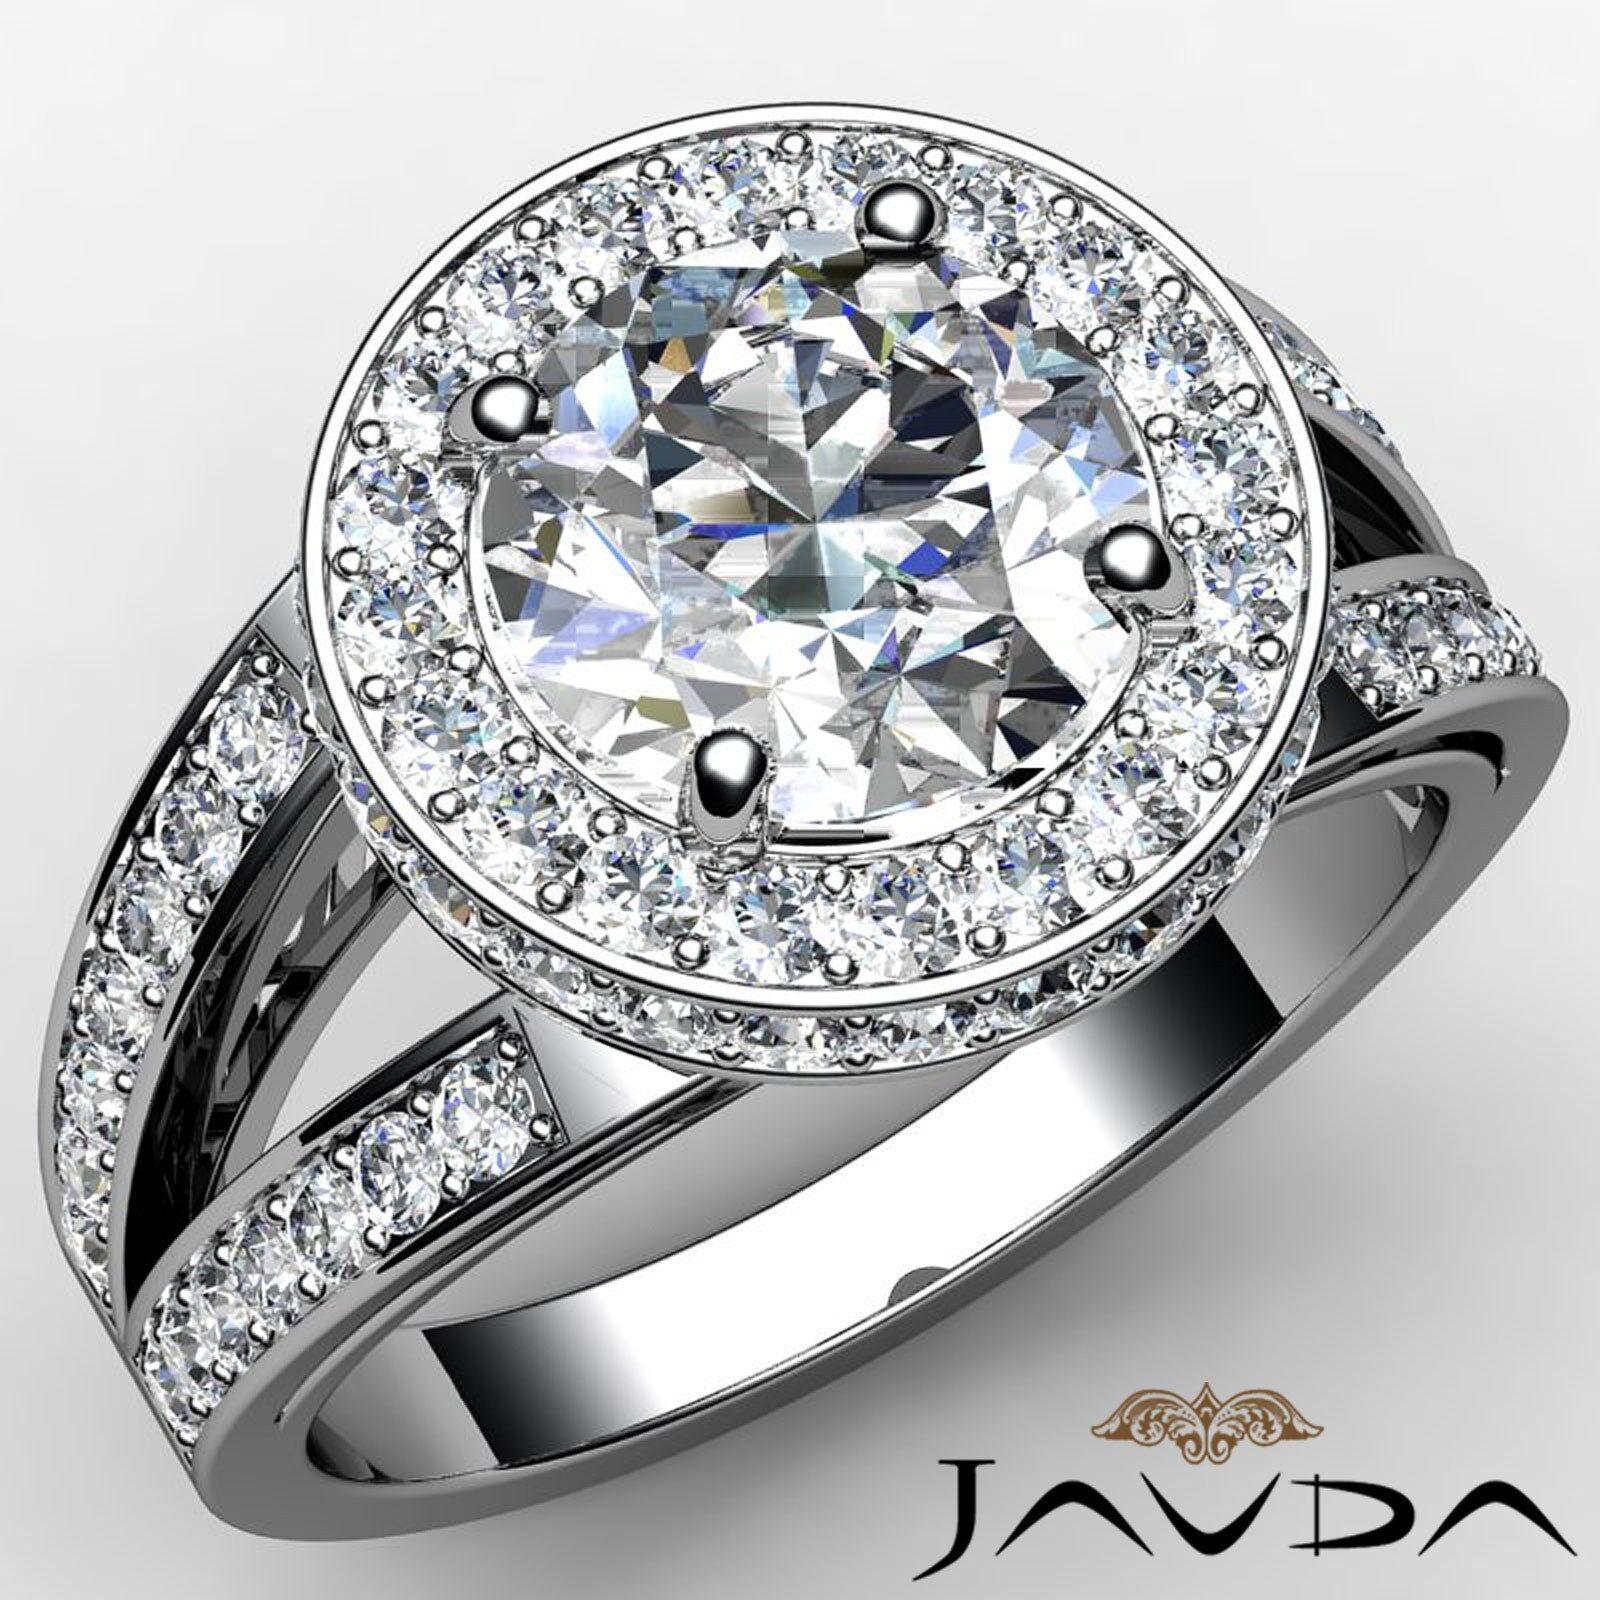 Circa Halo Filigree Split Shank Round Diamond Engagement Ring GIA F VS1 2.26 Ct